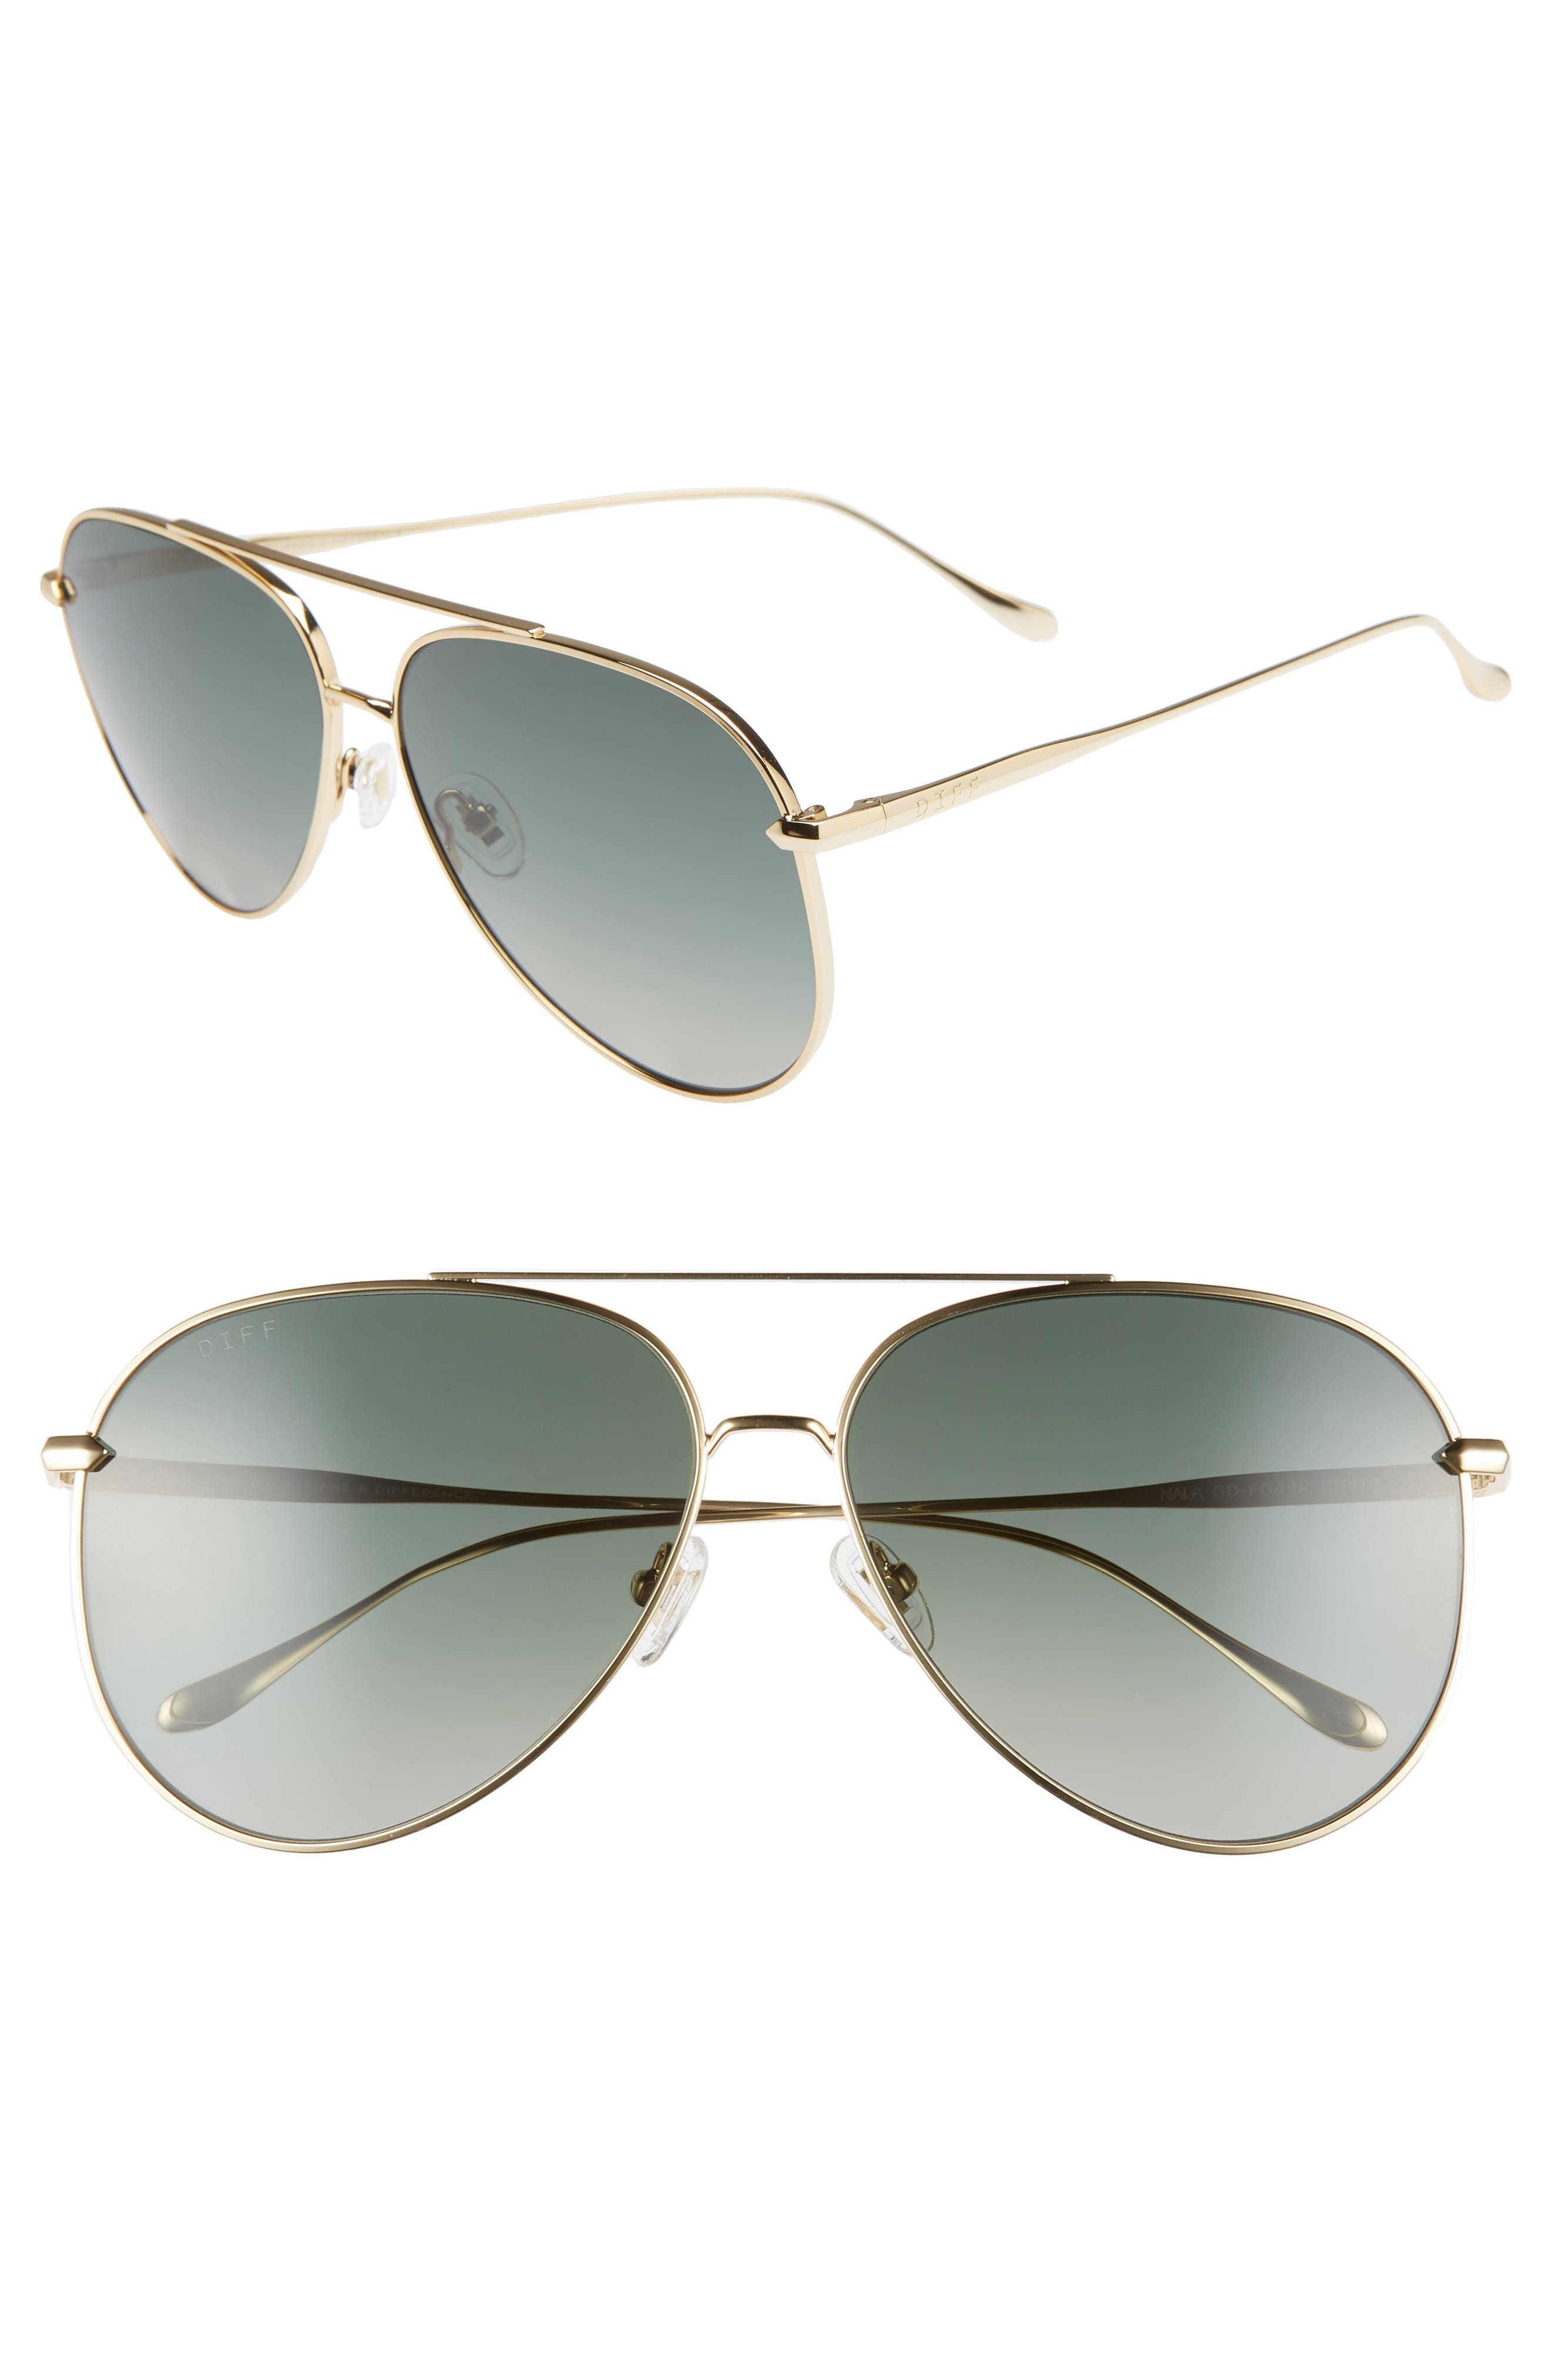 Nala 63mm Oversize Polarized Aviator Sunglasses,                         Main,                         color, GOLD/ G15